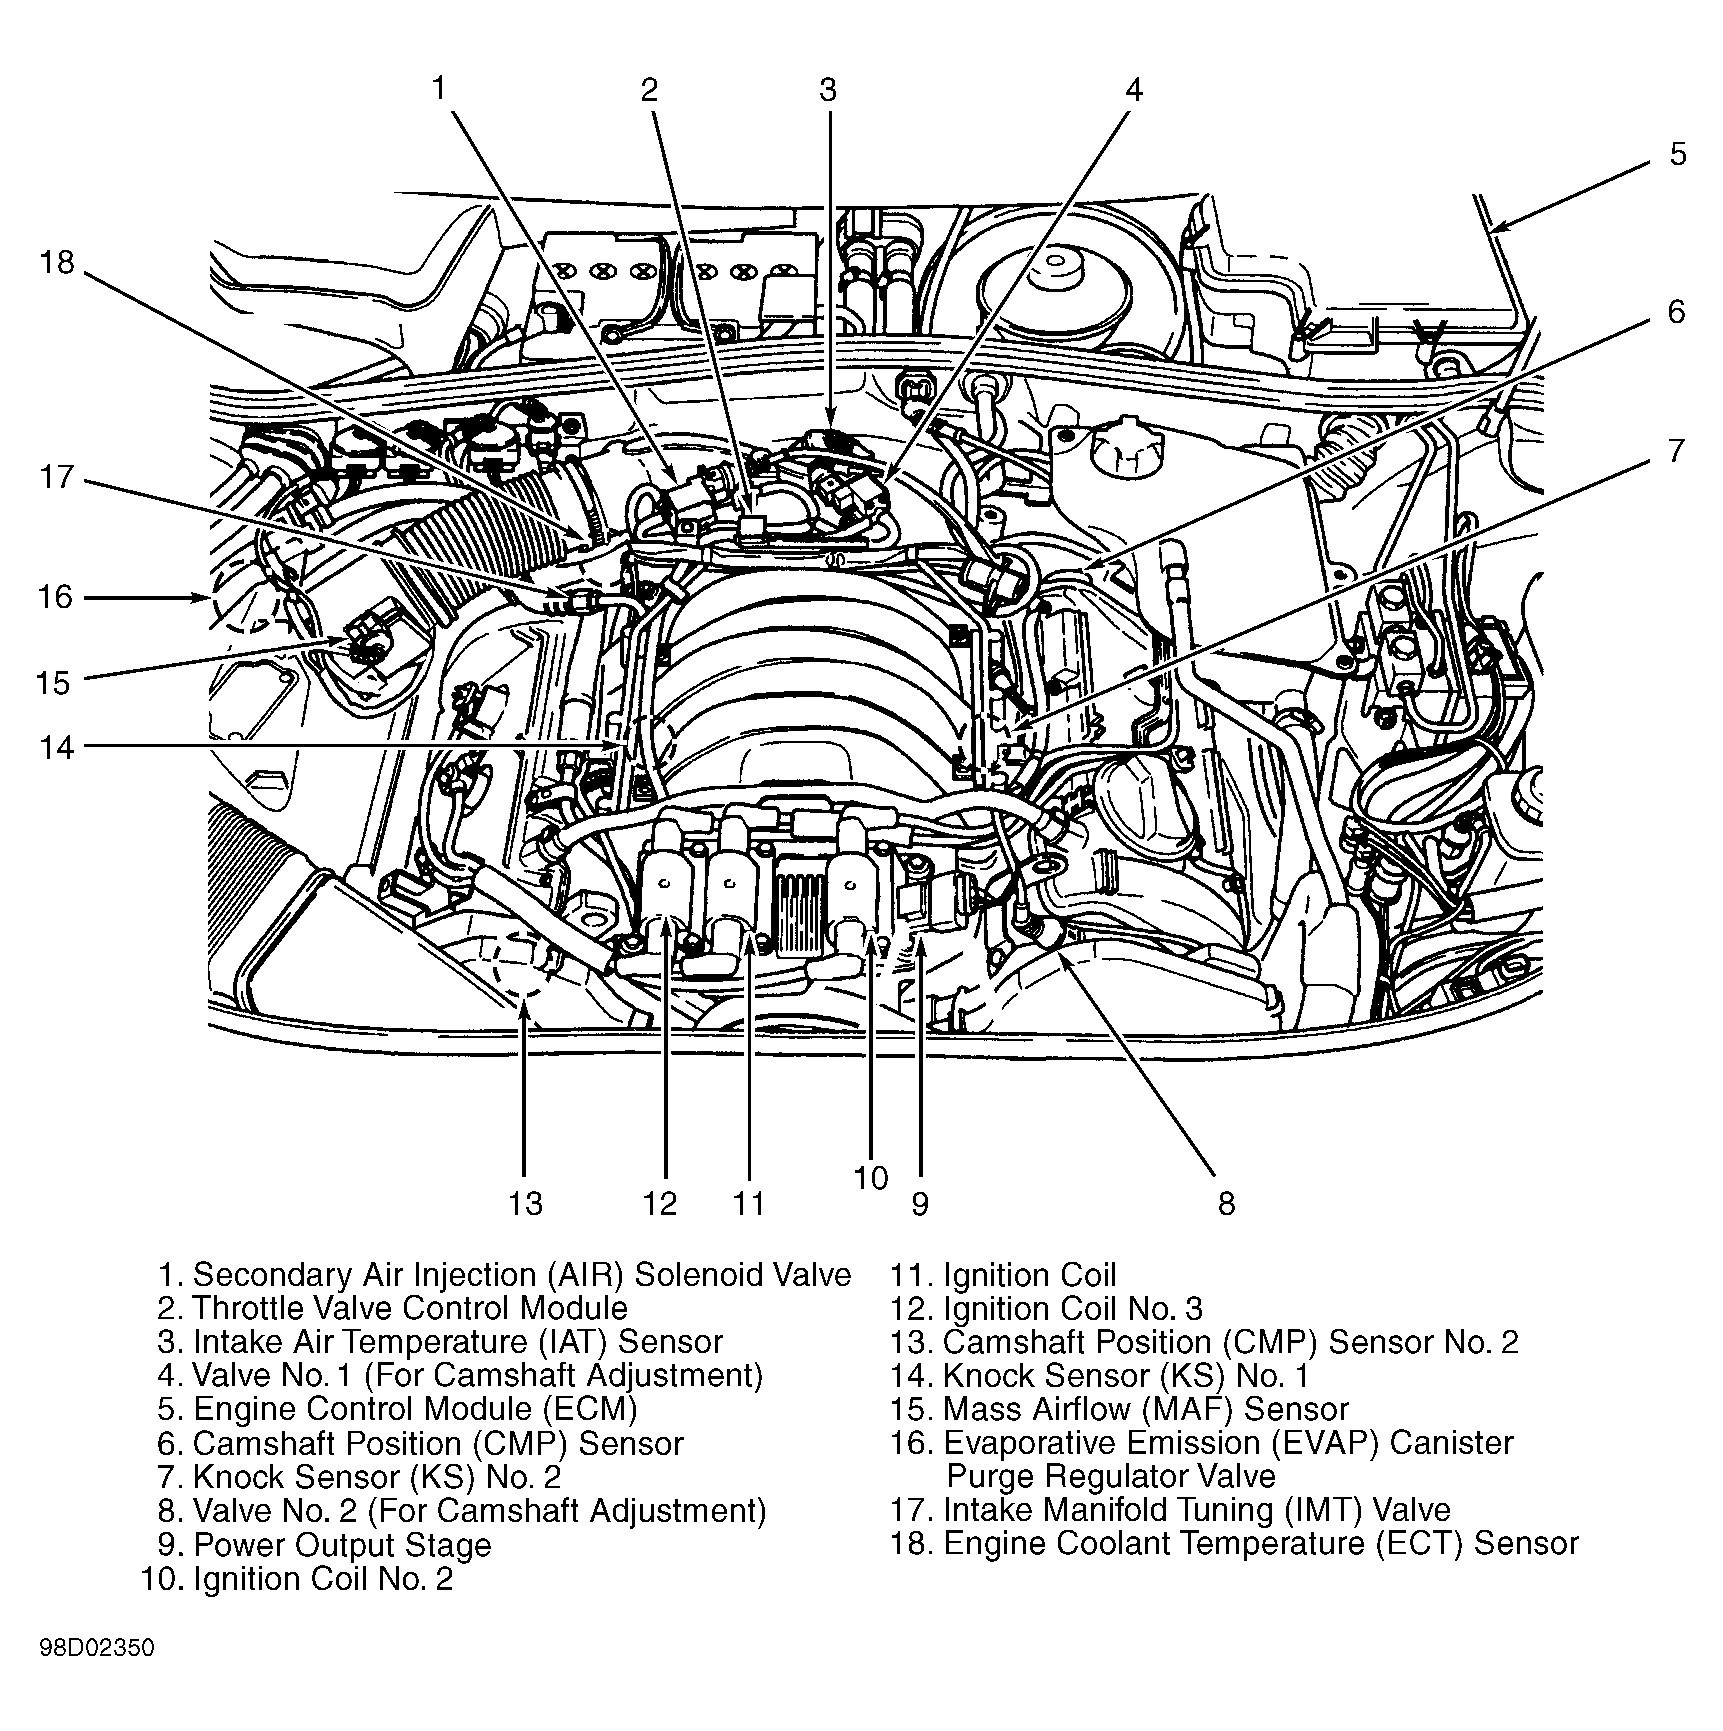 Chrysler 3 5l Engine Diagram - custom project wiring diagram on